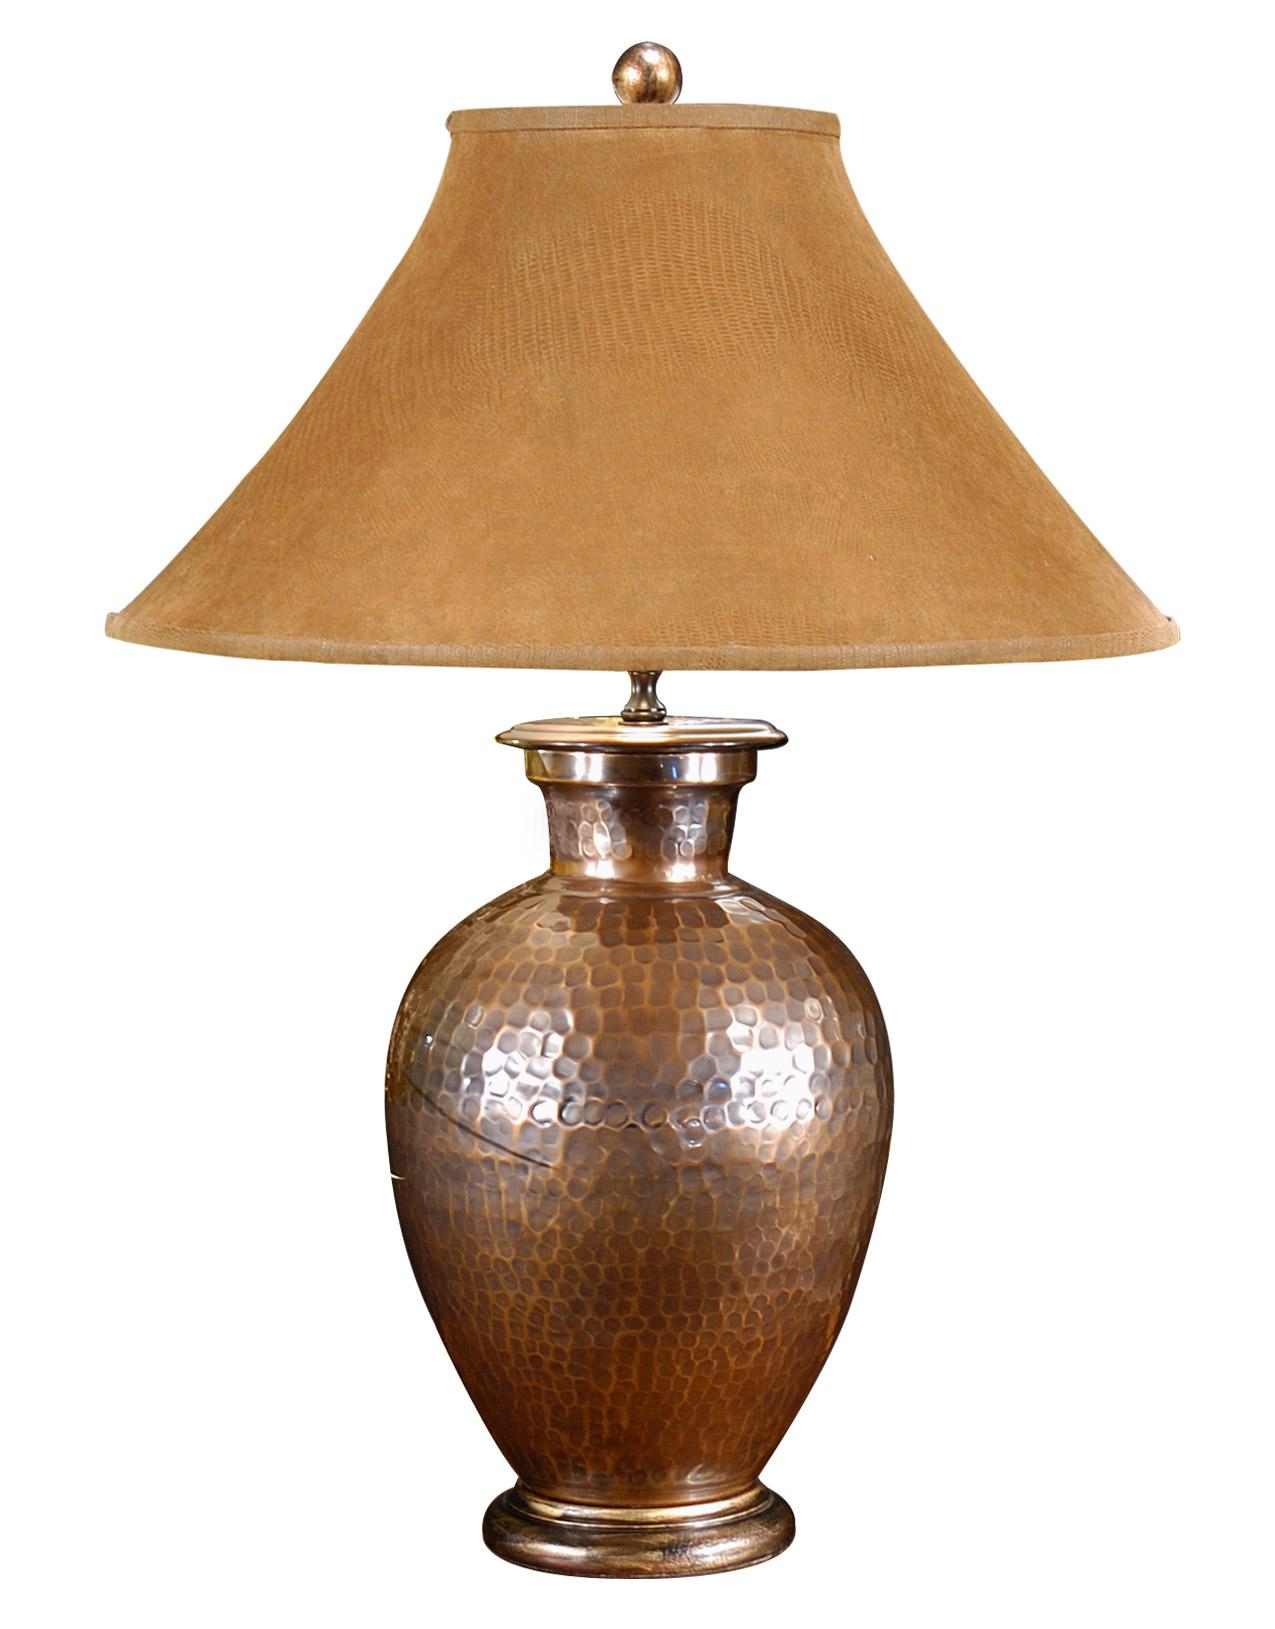 Wildwood 21087 Antique Copper Table Lamp